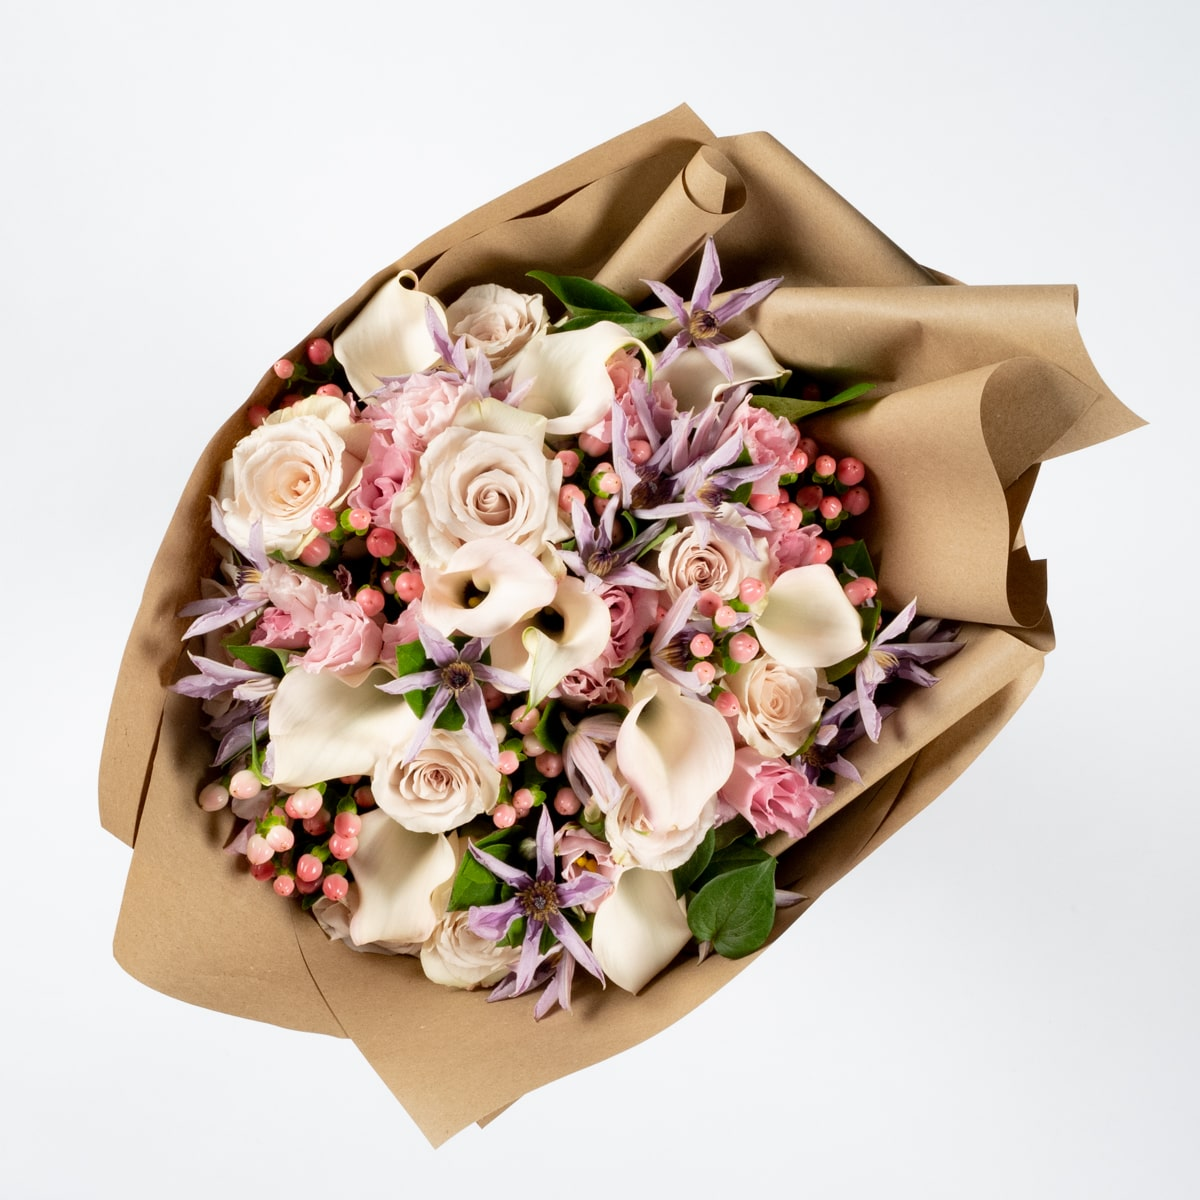 Bloom Flower Delivery | Blakeney Bouquet